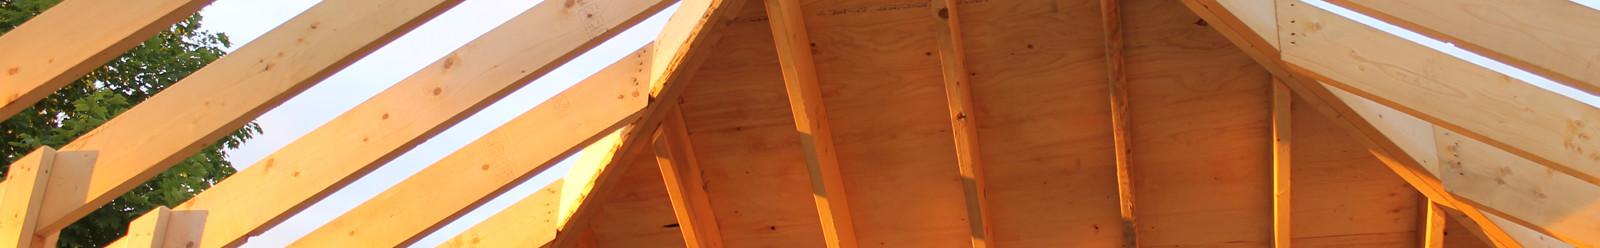 Gazebo / structure de bois